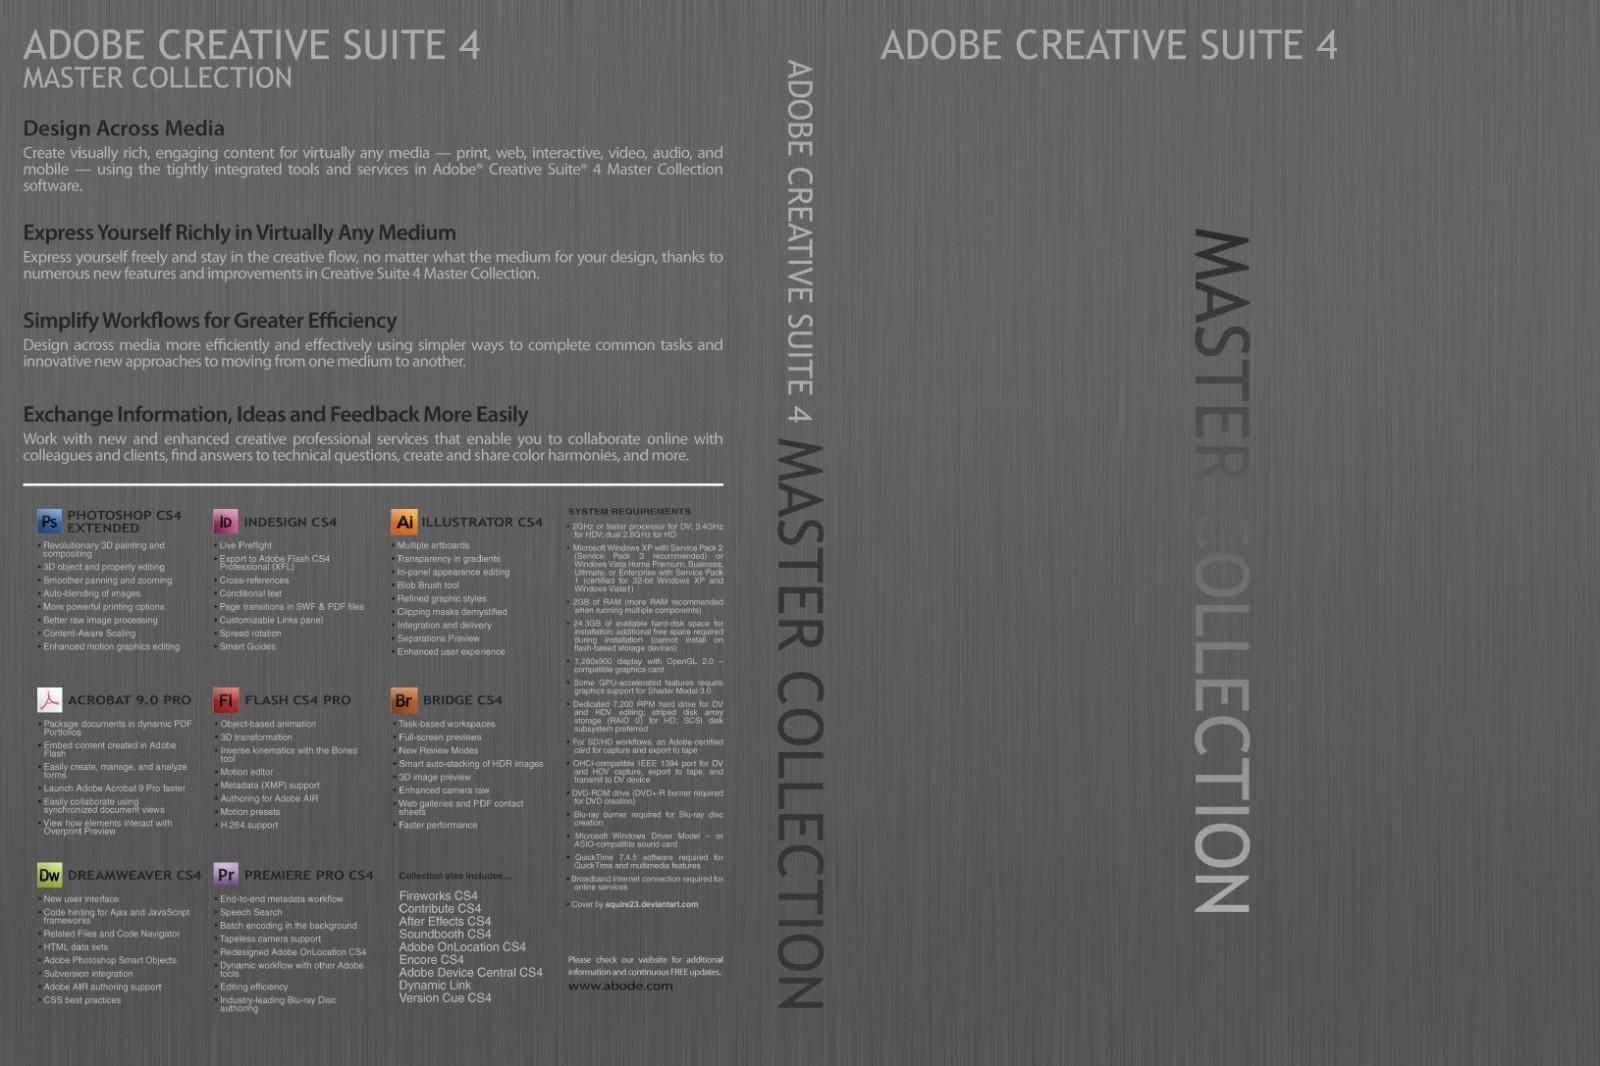 Rar relnofollow Adobe Flash CS4 Professional 10 0.rar Oct 25, 2010.